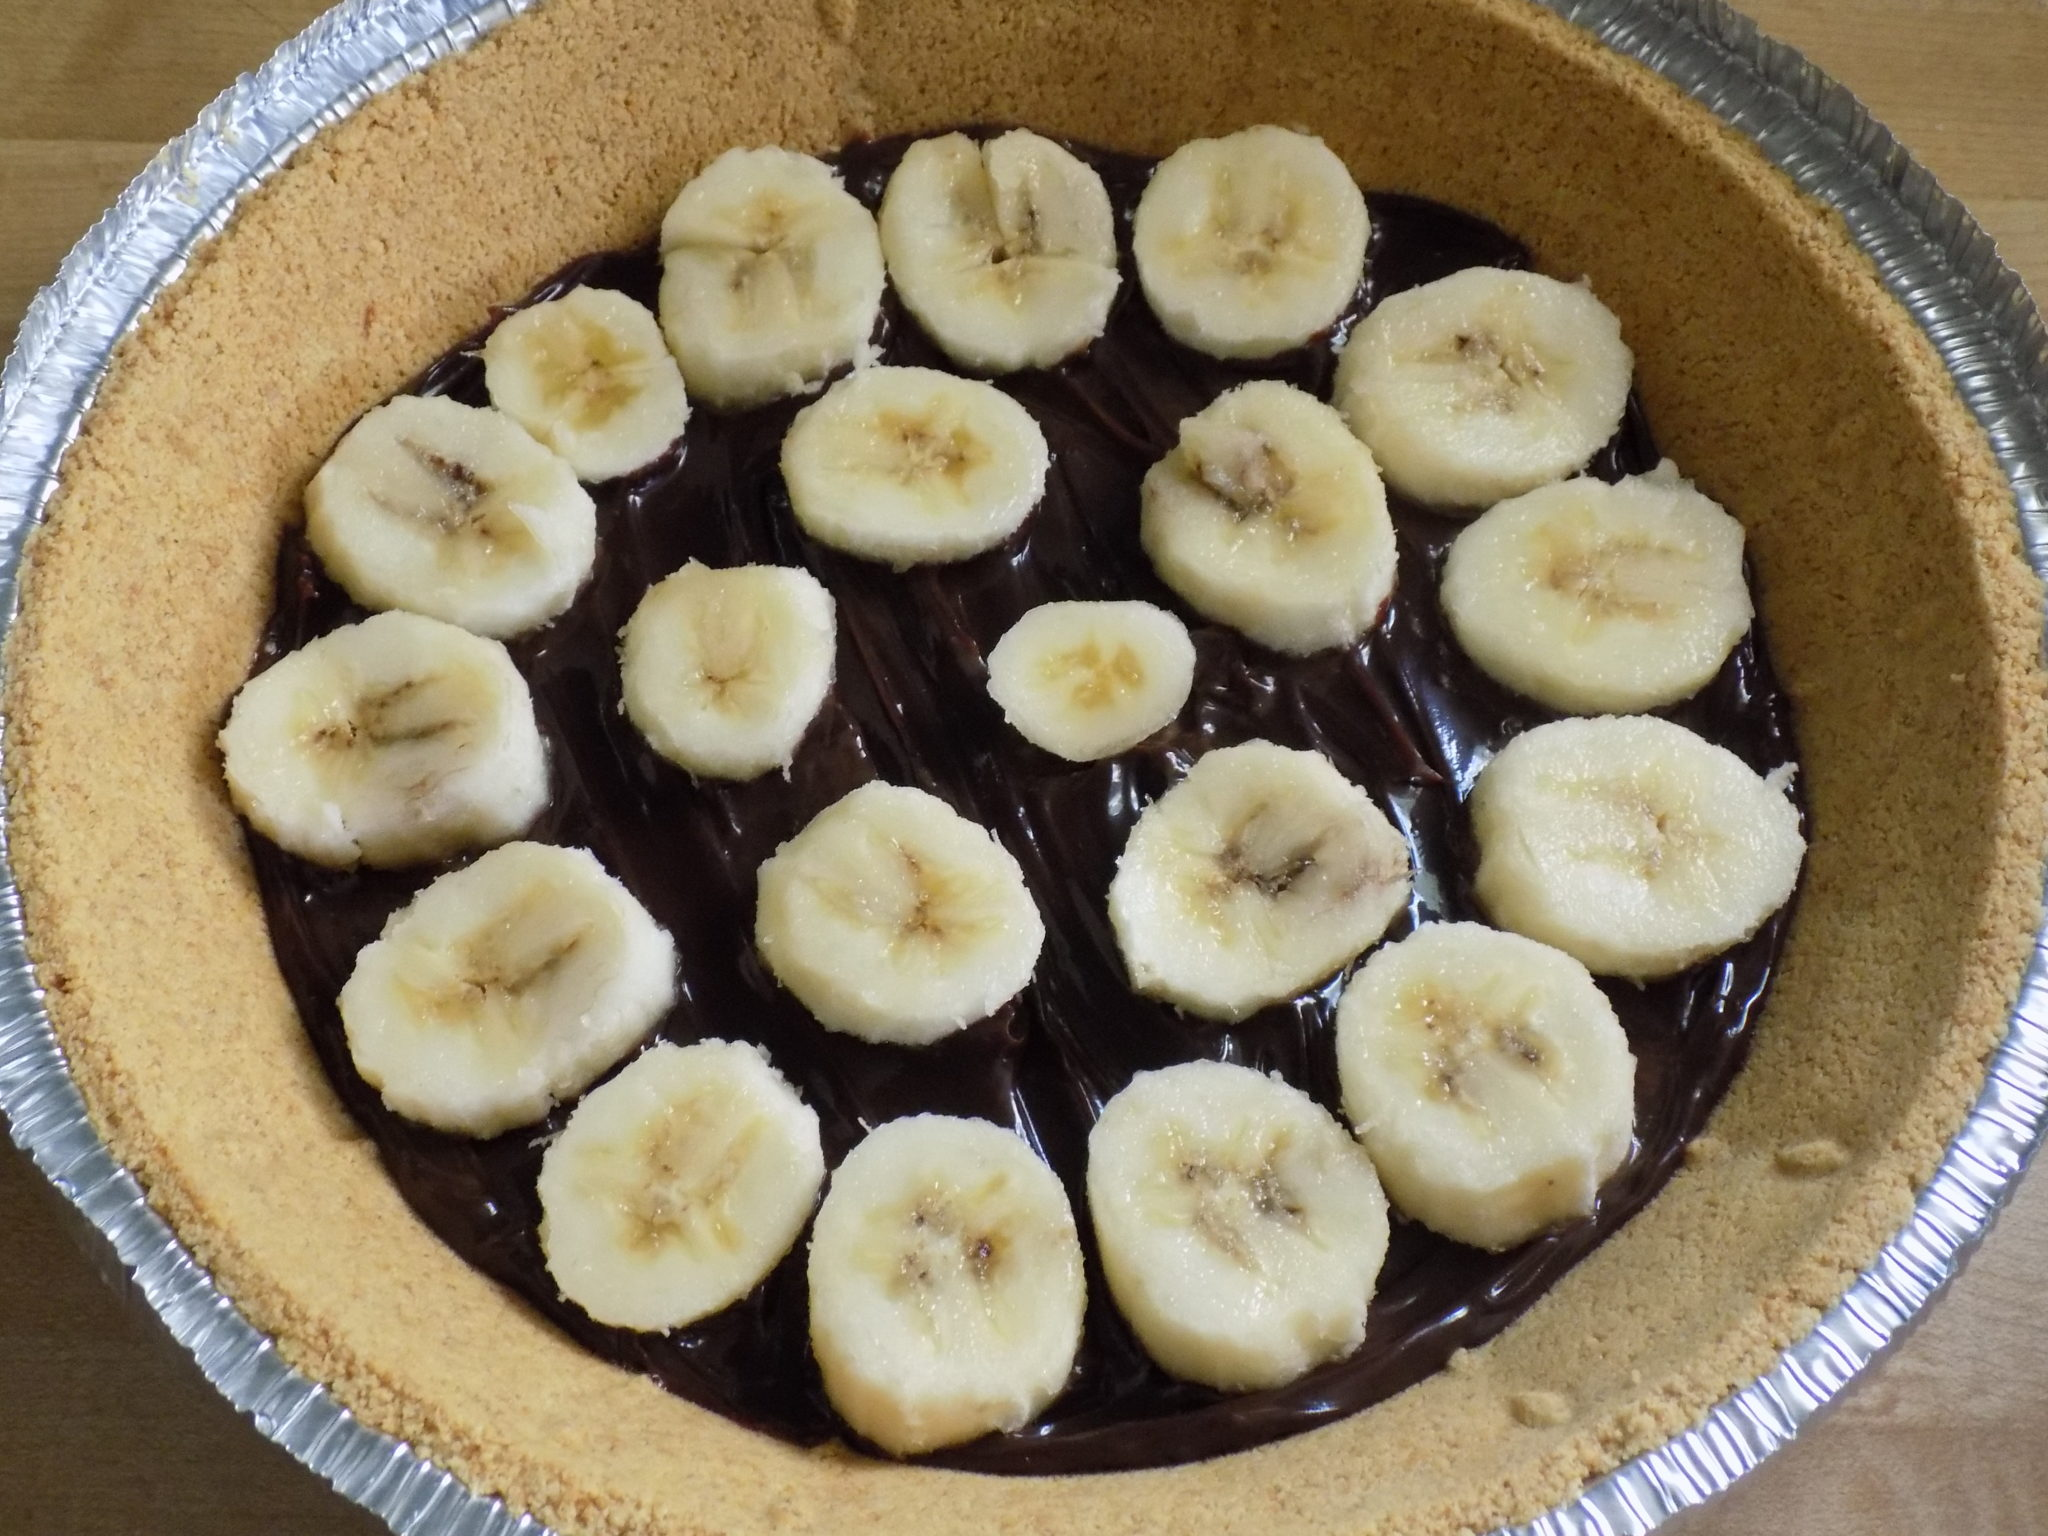 No-Bake Chocolate Fudge Banana Cream Pie